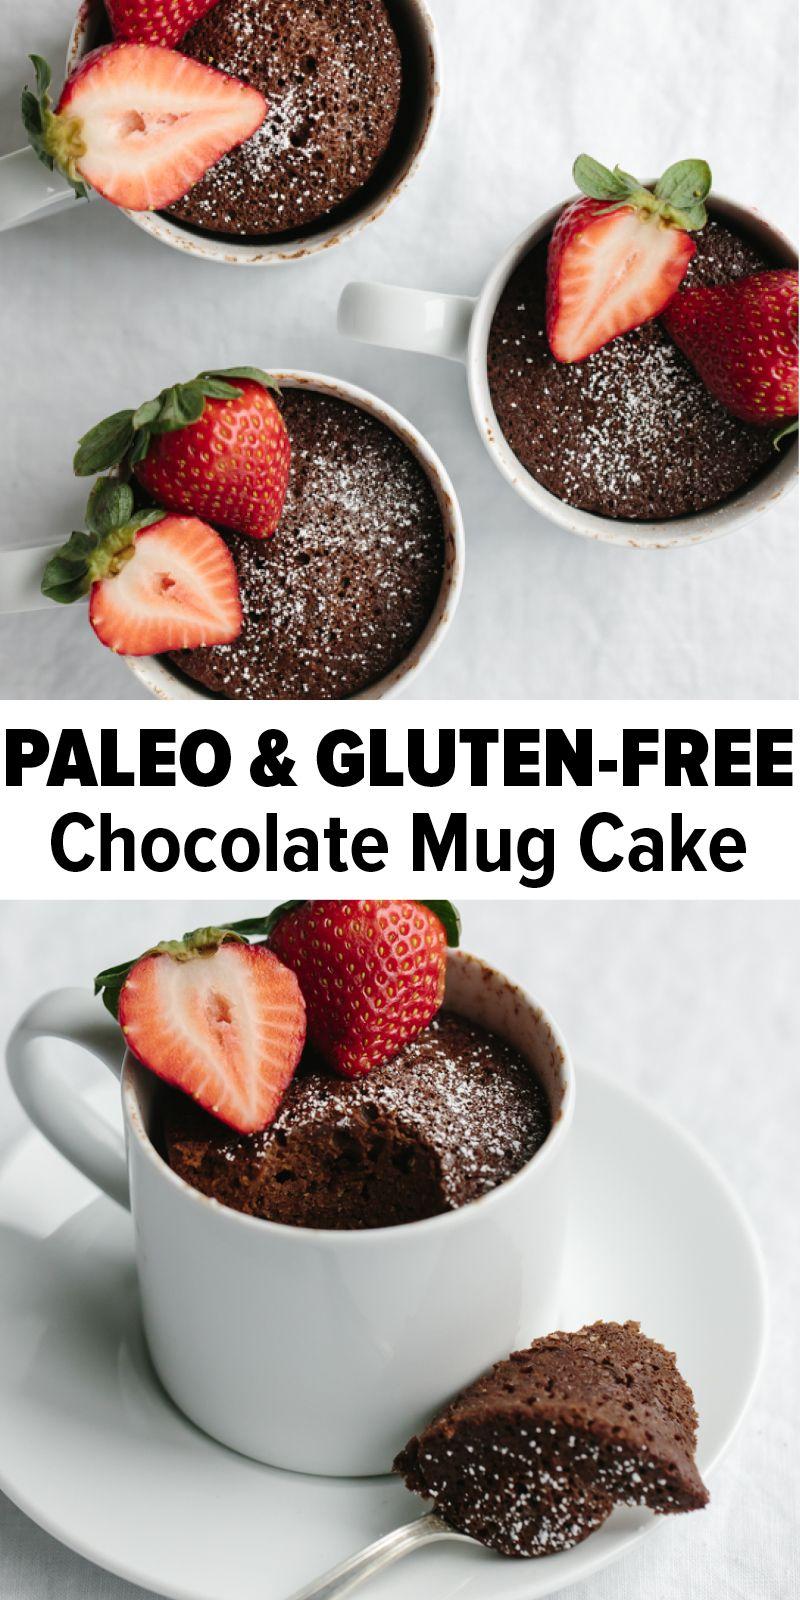 Chocolate Mug Cake - Gluten-Free Paleo Recipe images